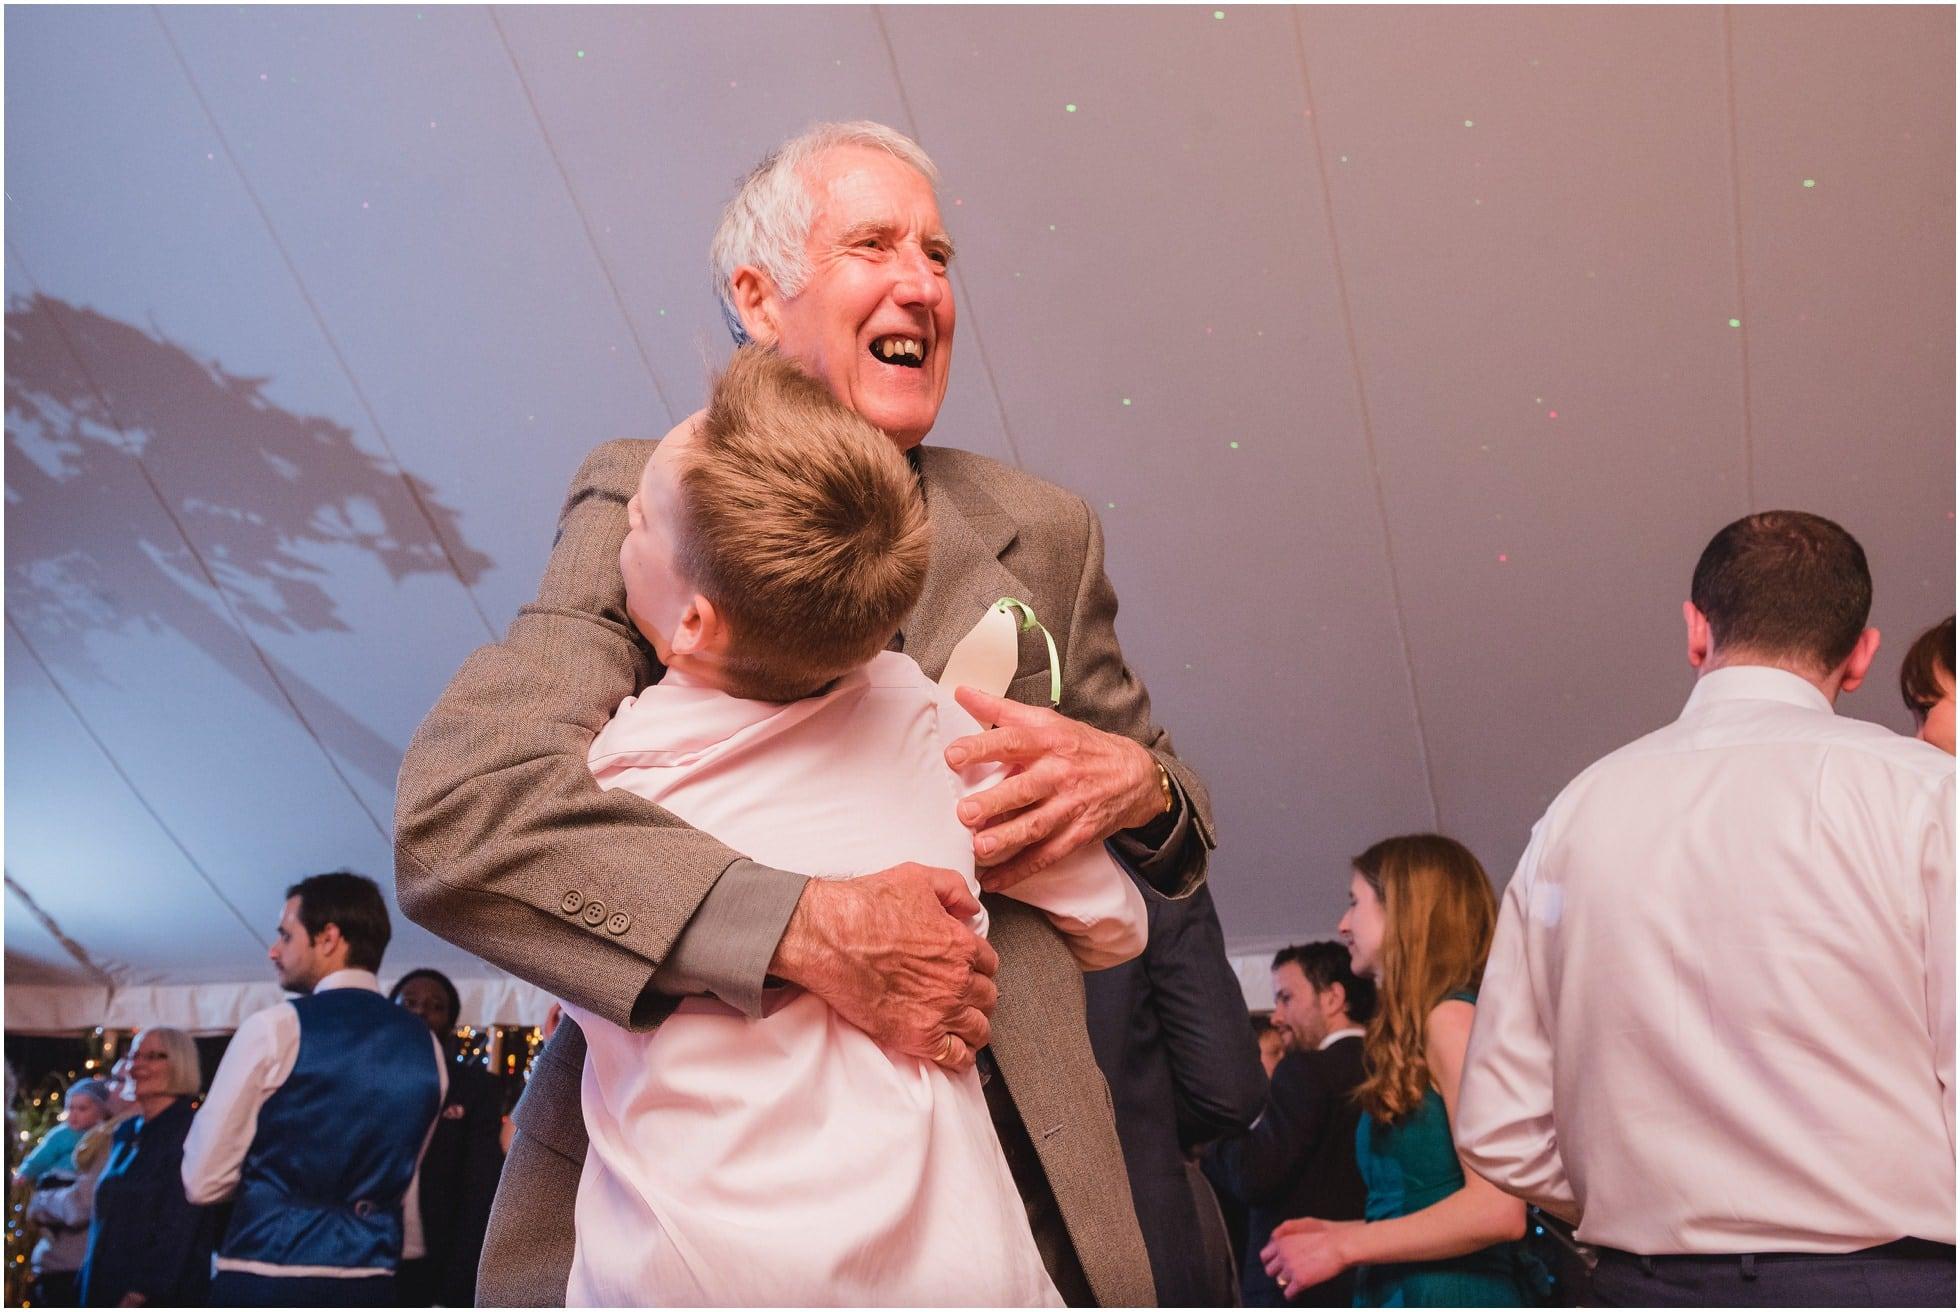 Granddad hugs his grandson